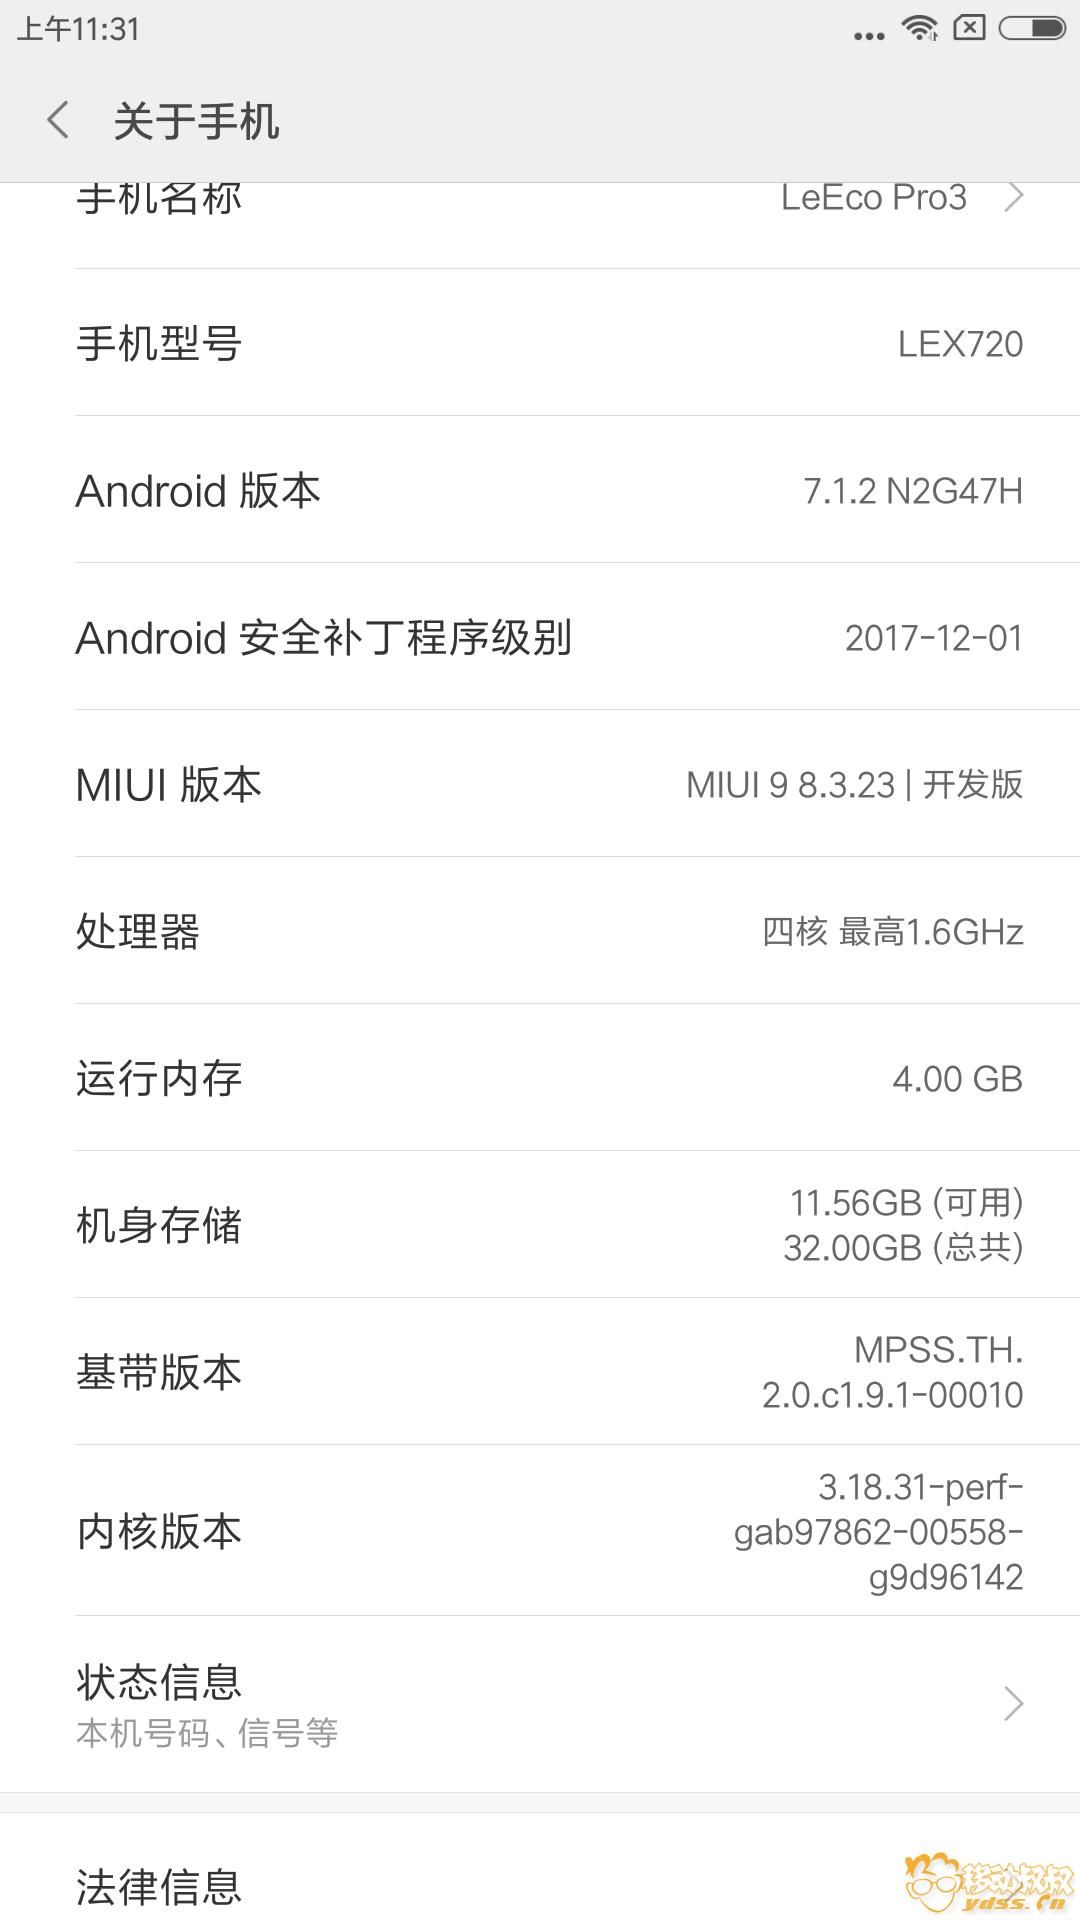 Screenshot_2018-03-23-11-31-00-478_com.android.settings.png